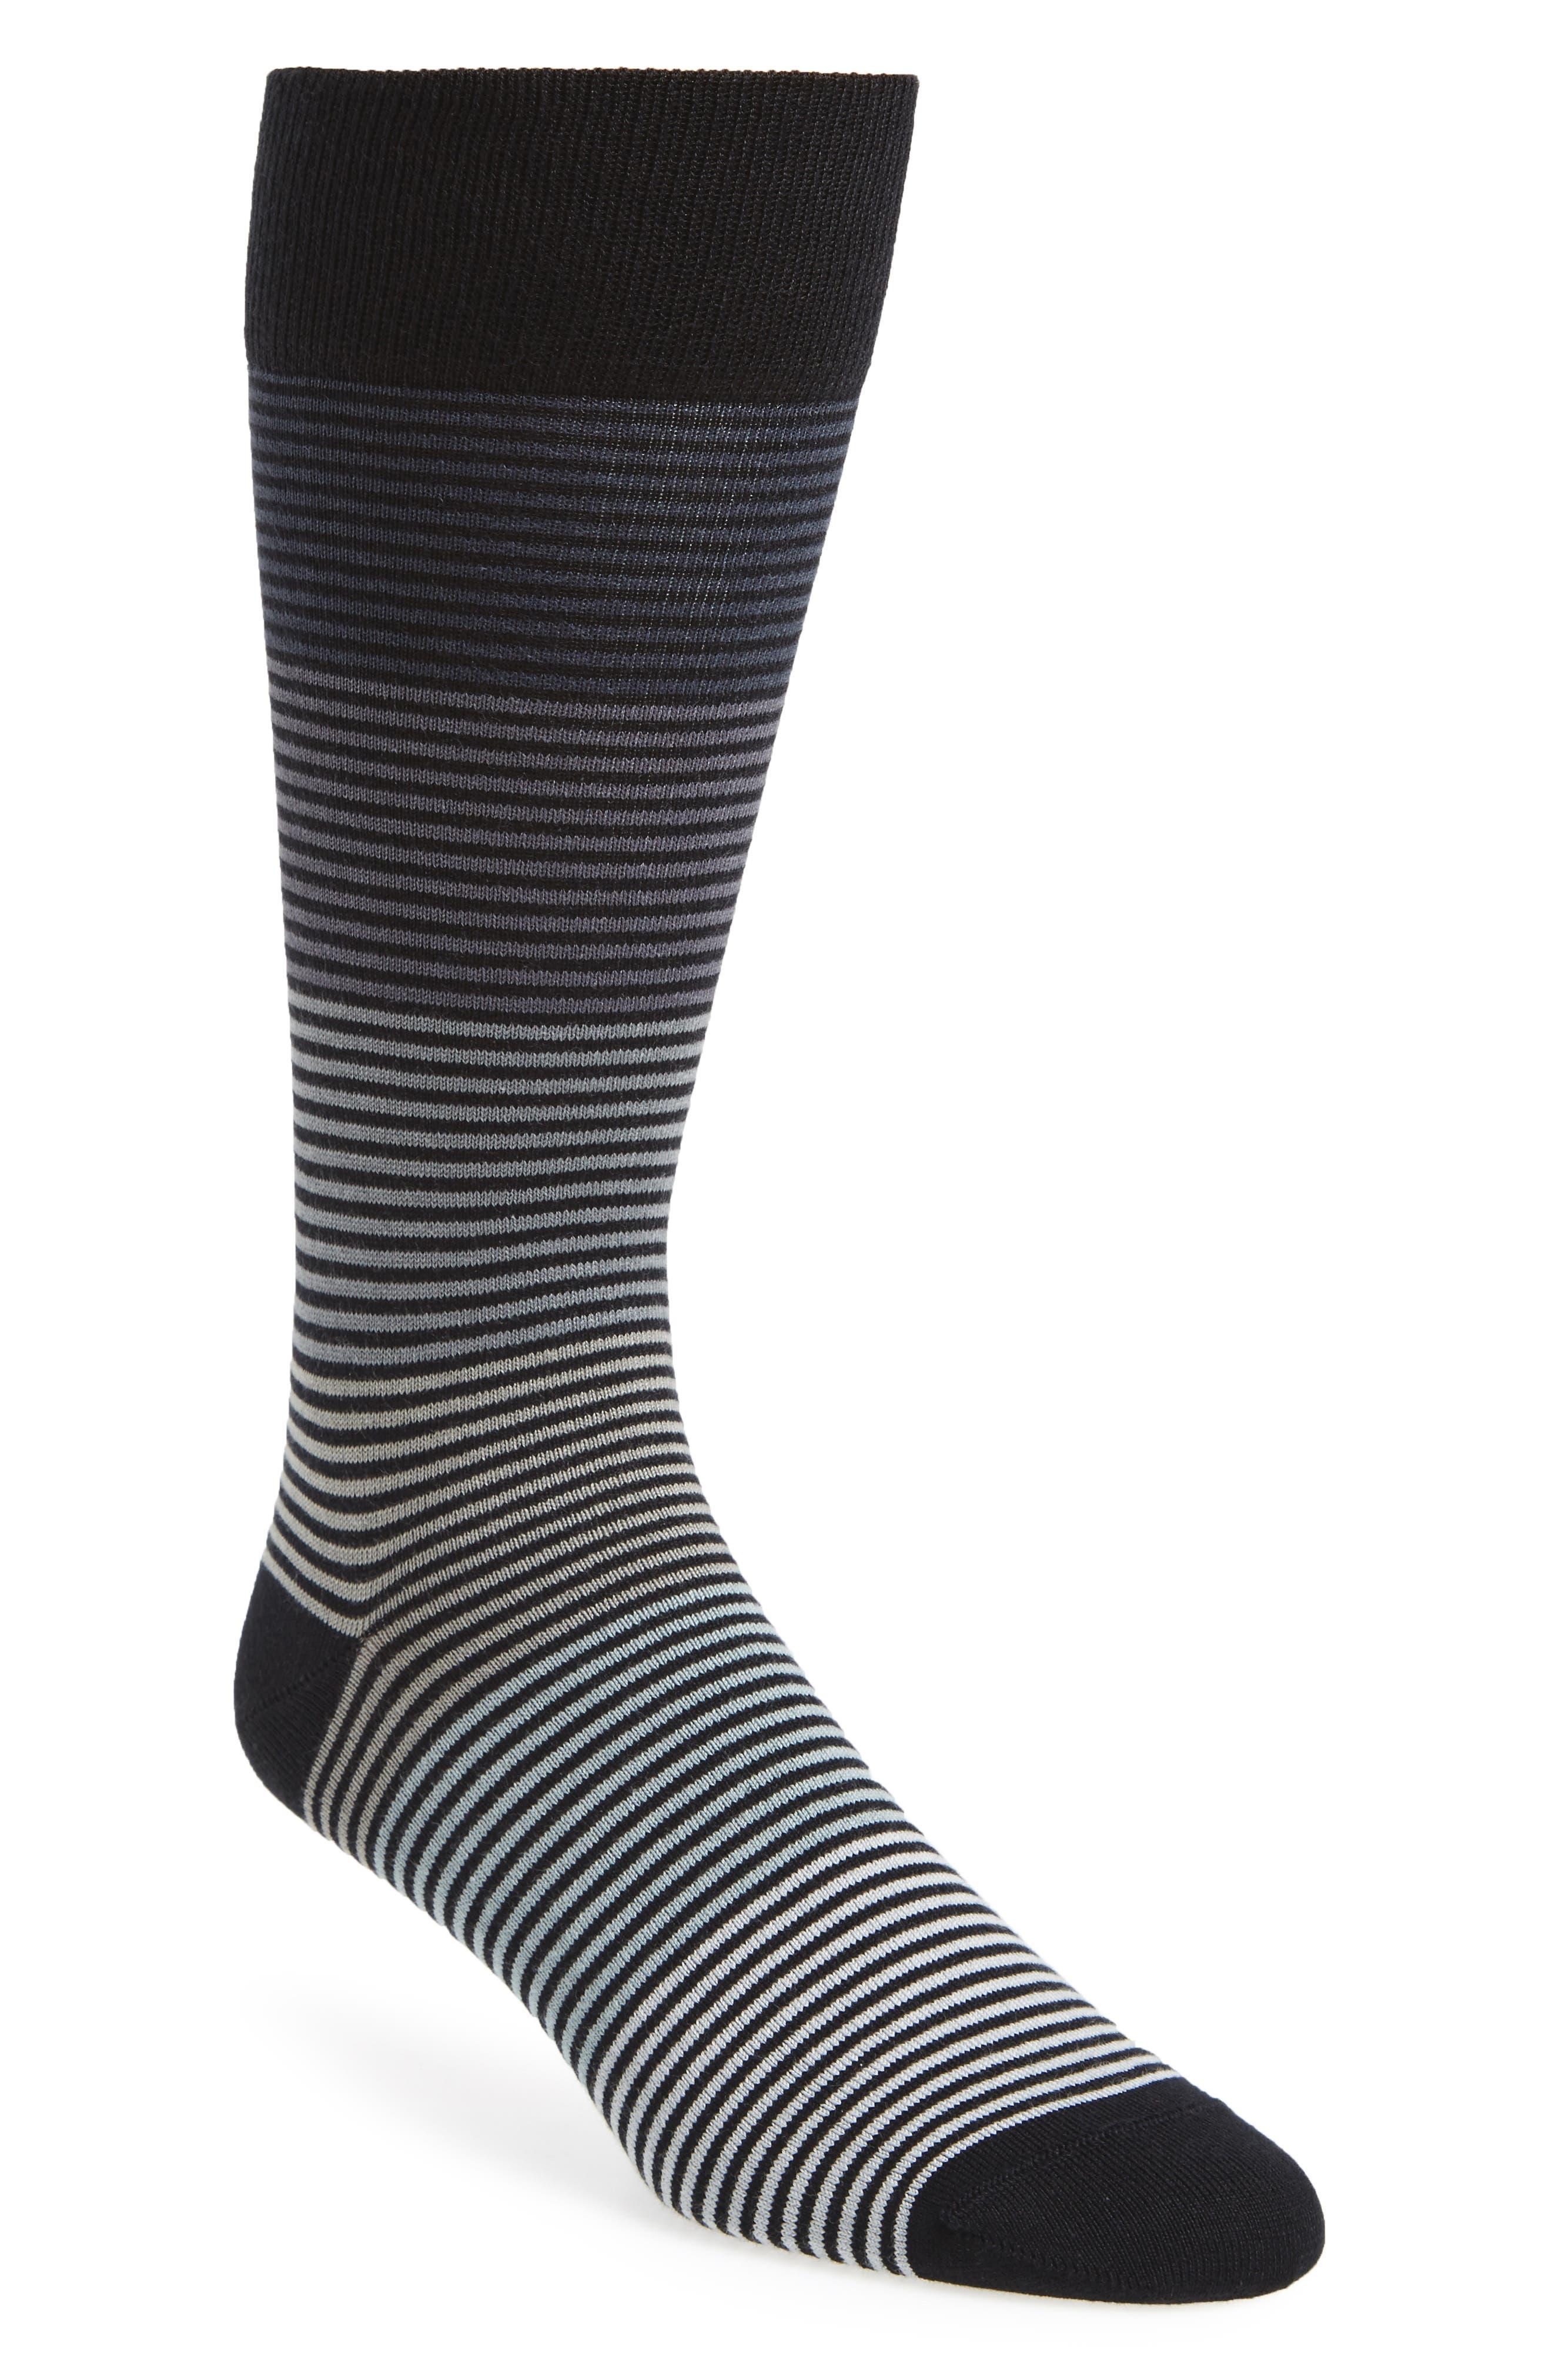 Gradient Stripe Socks,                             Main thumbnail 1, color,                             001